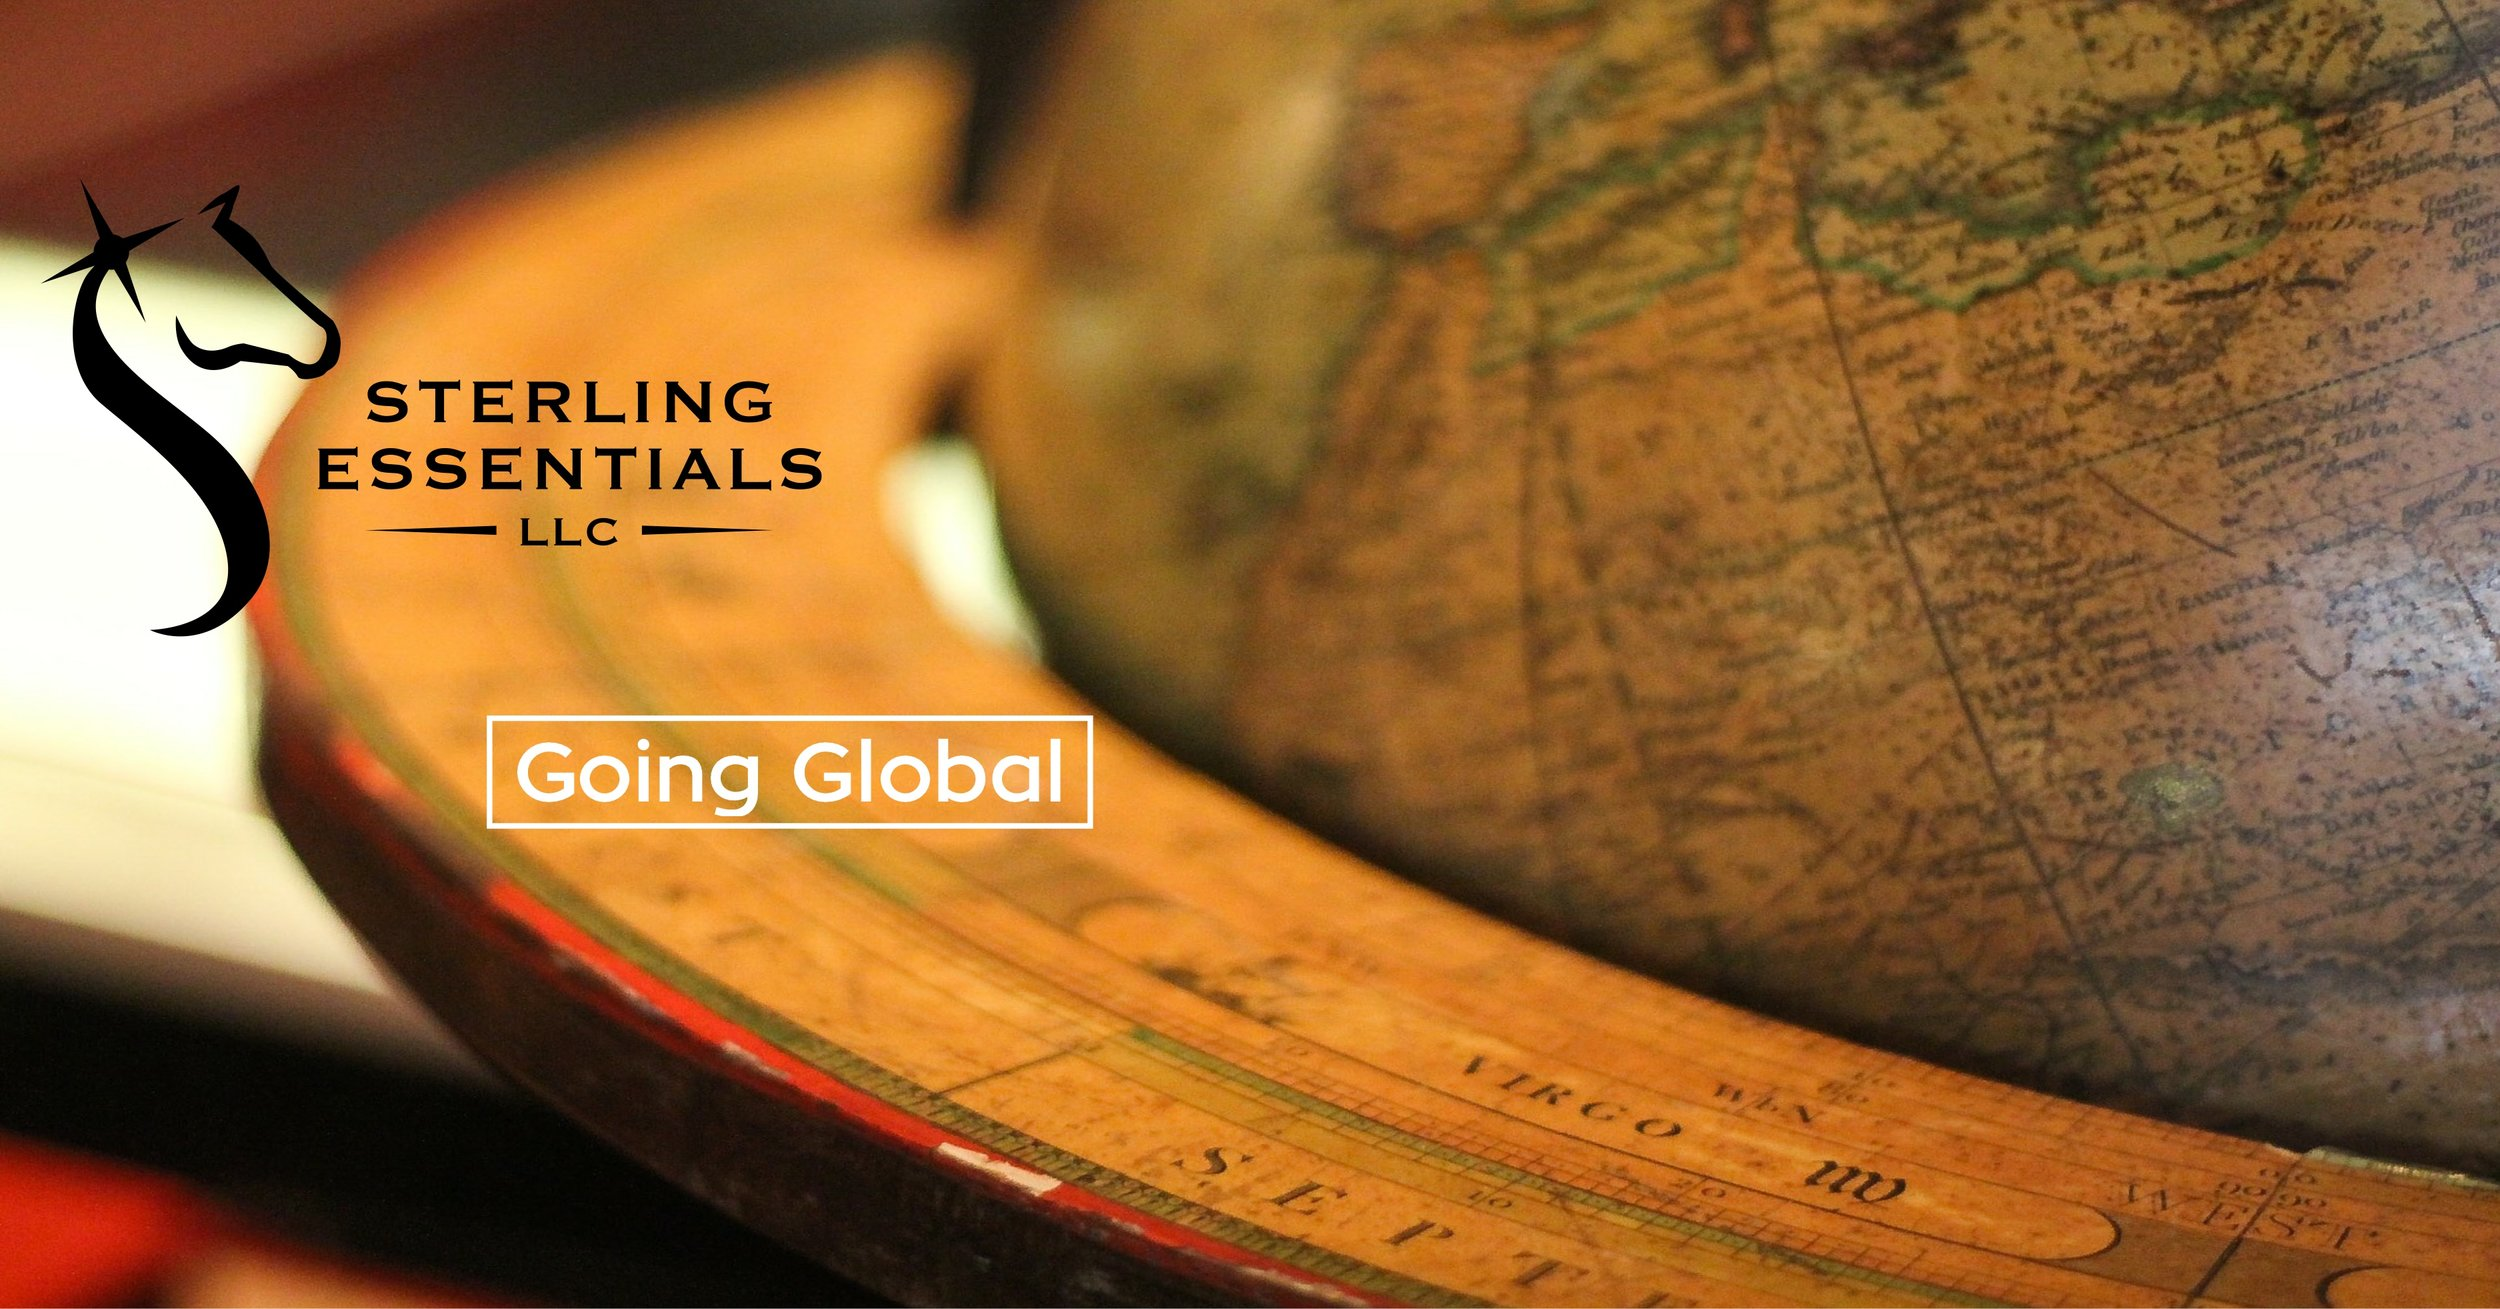 Going Global 1200x628.jpg